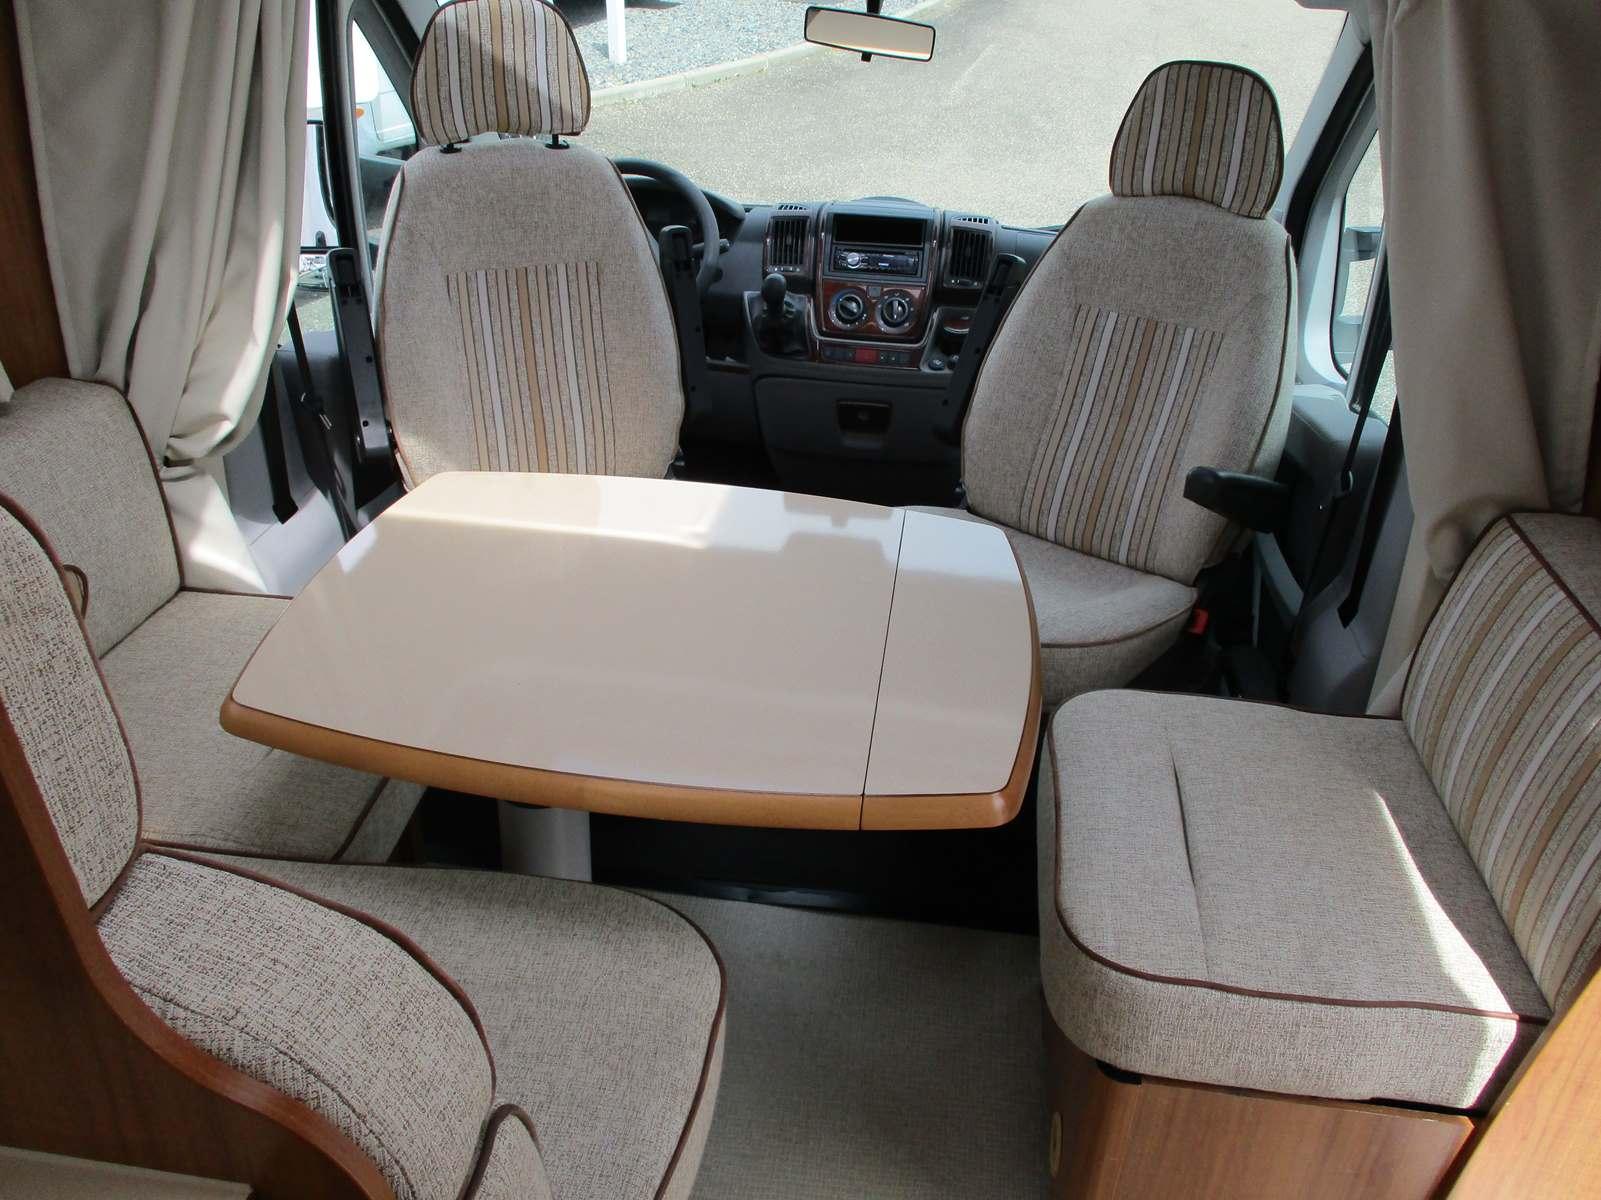 Eura Mobil 710 Qb - 5